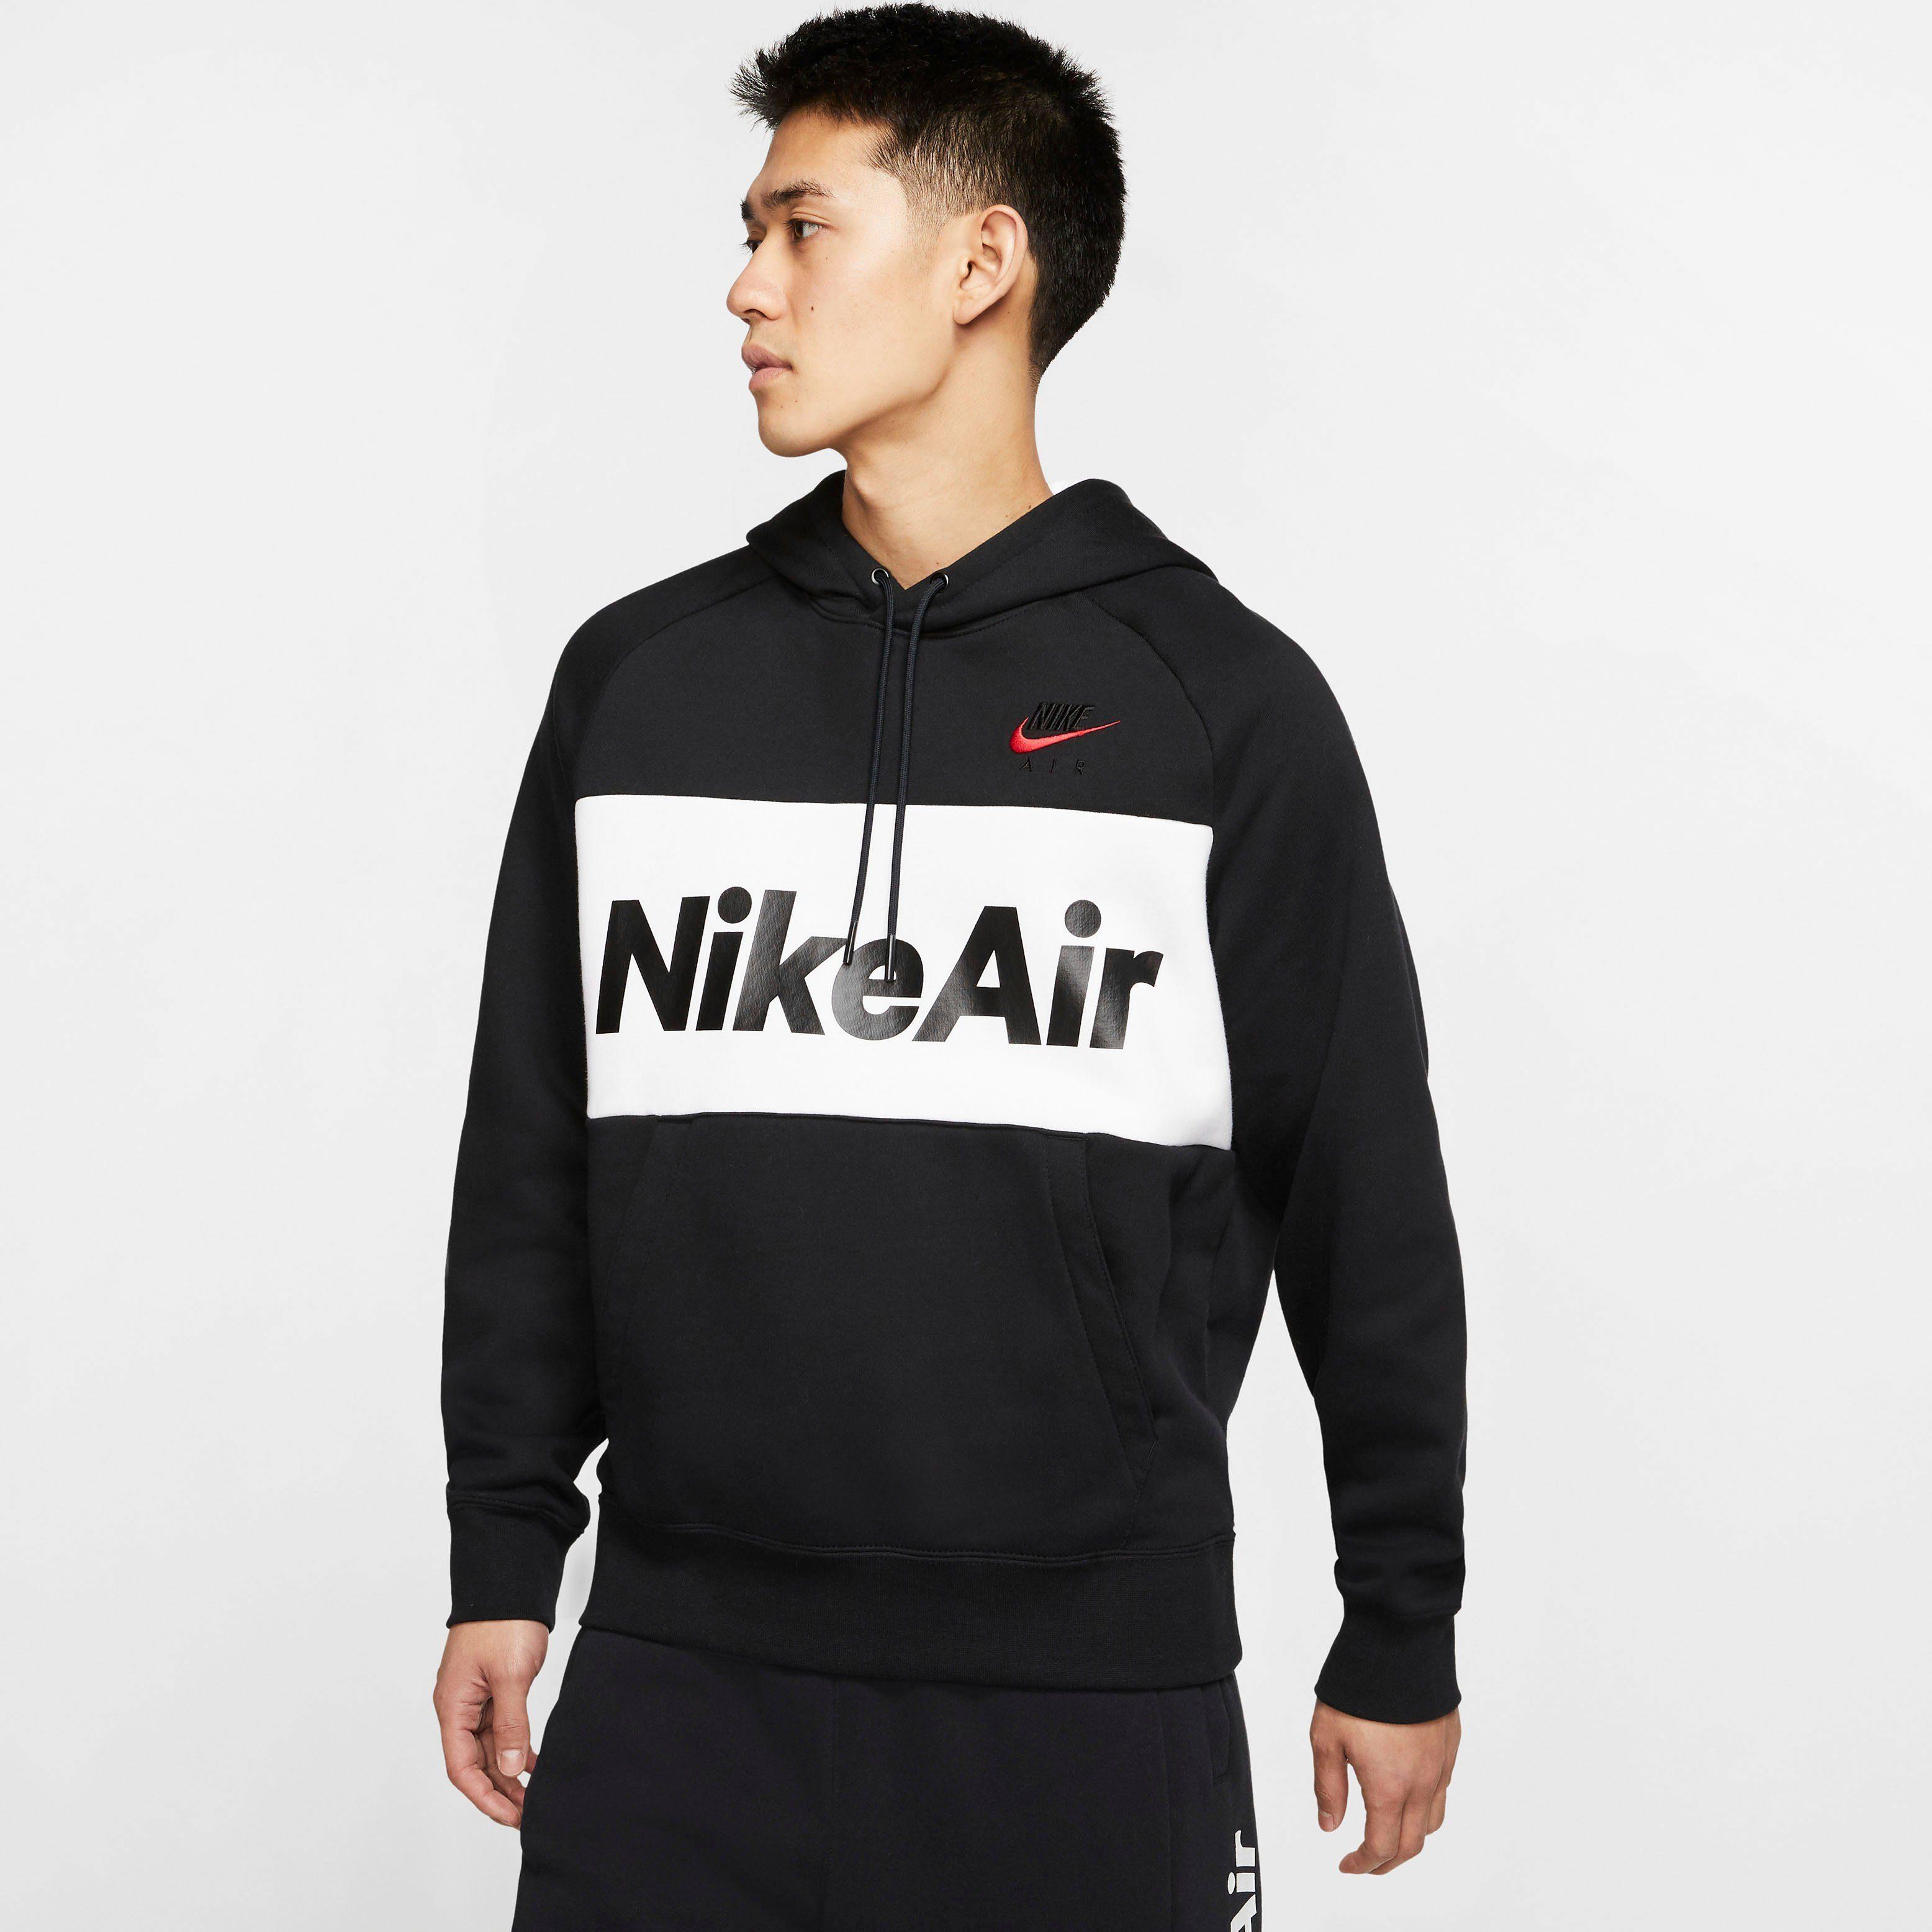 Nike Sportswear Kapuzensweatshirt »Men's Fleece Pullover Hoodie« online kaufen   OTTO